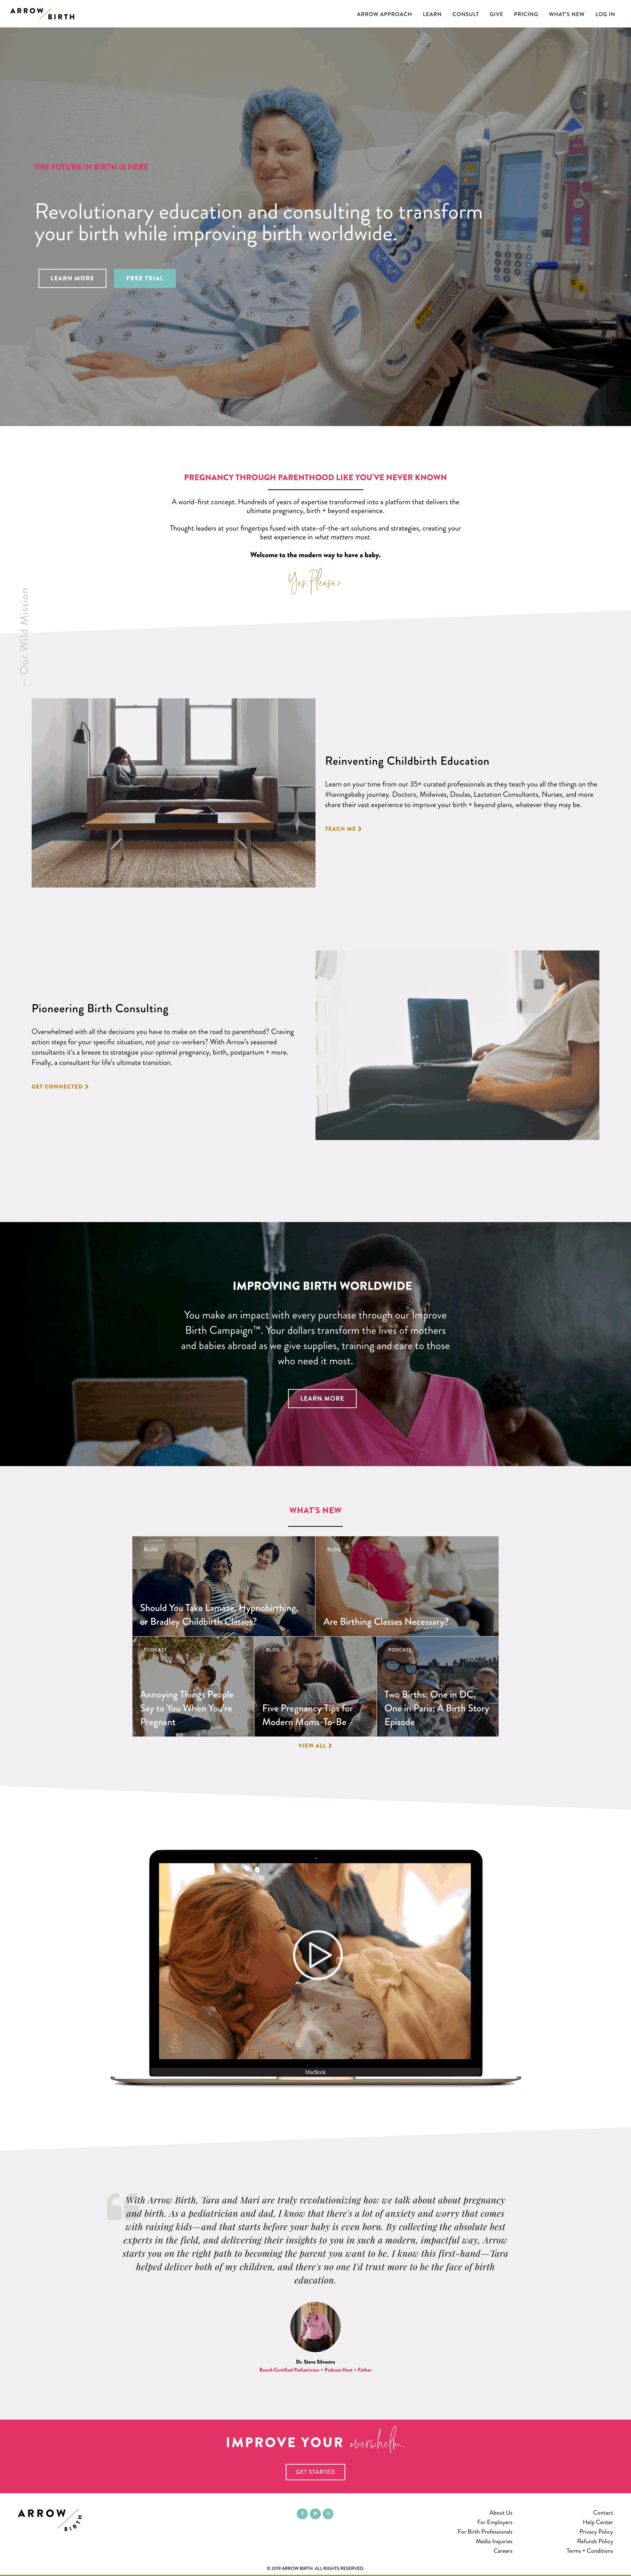 Arrow Birth Custom LMS Website Project